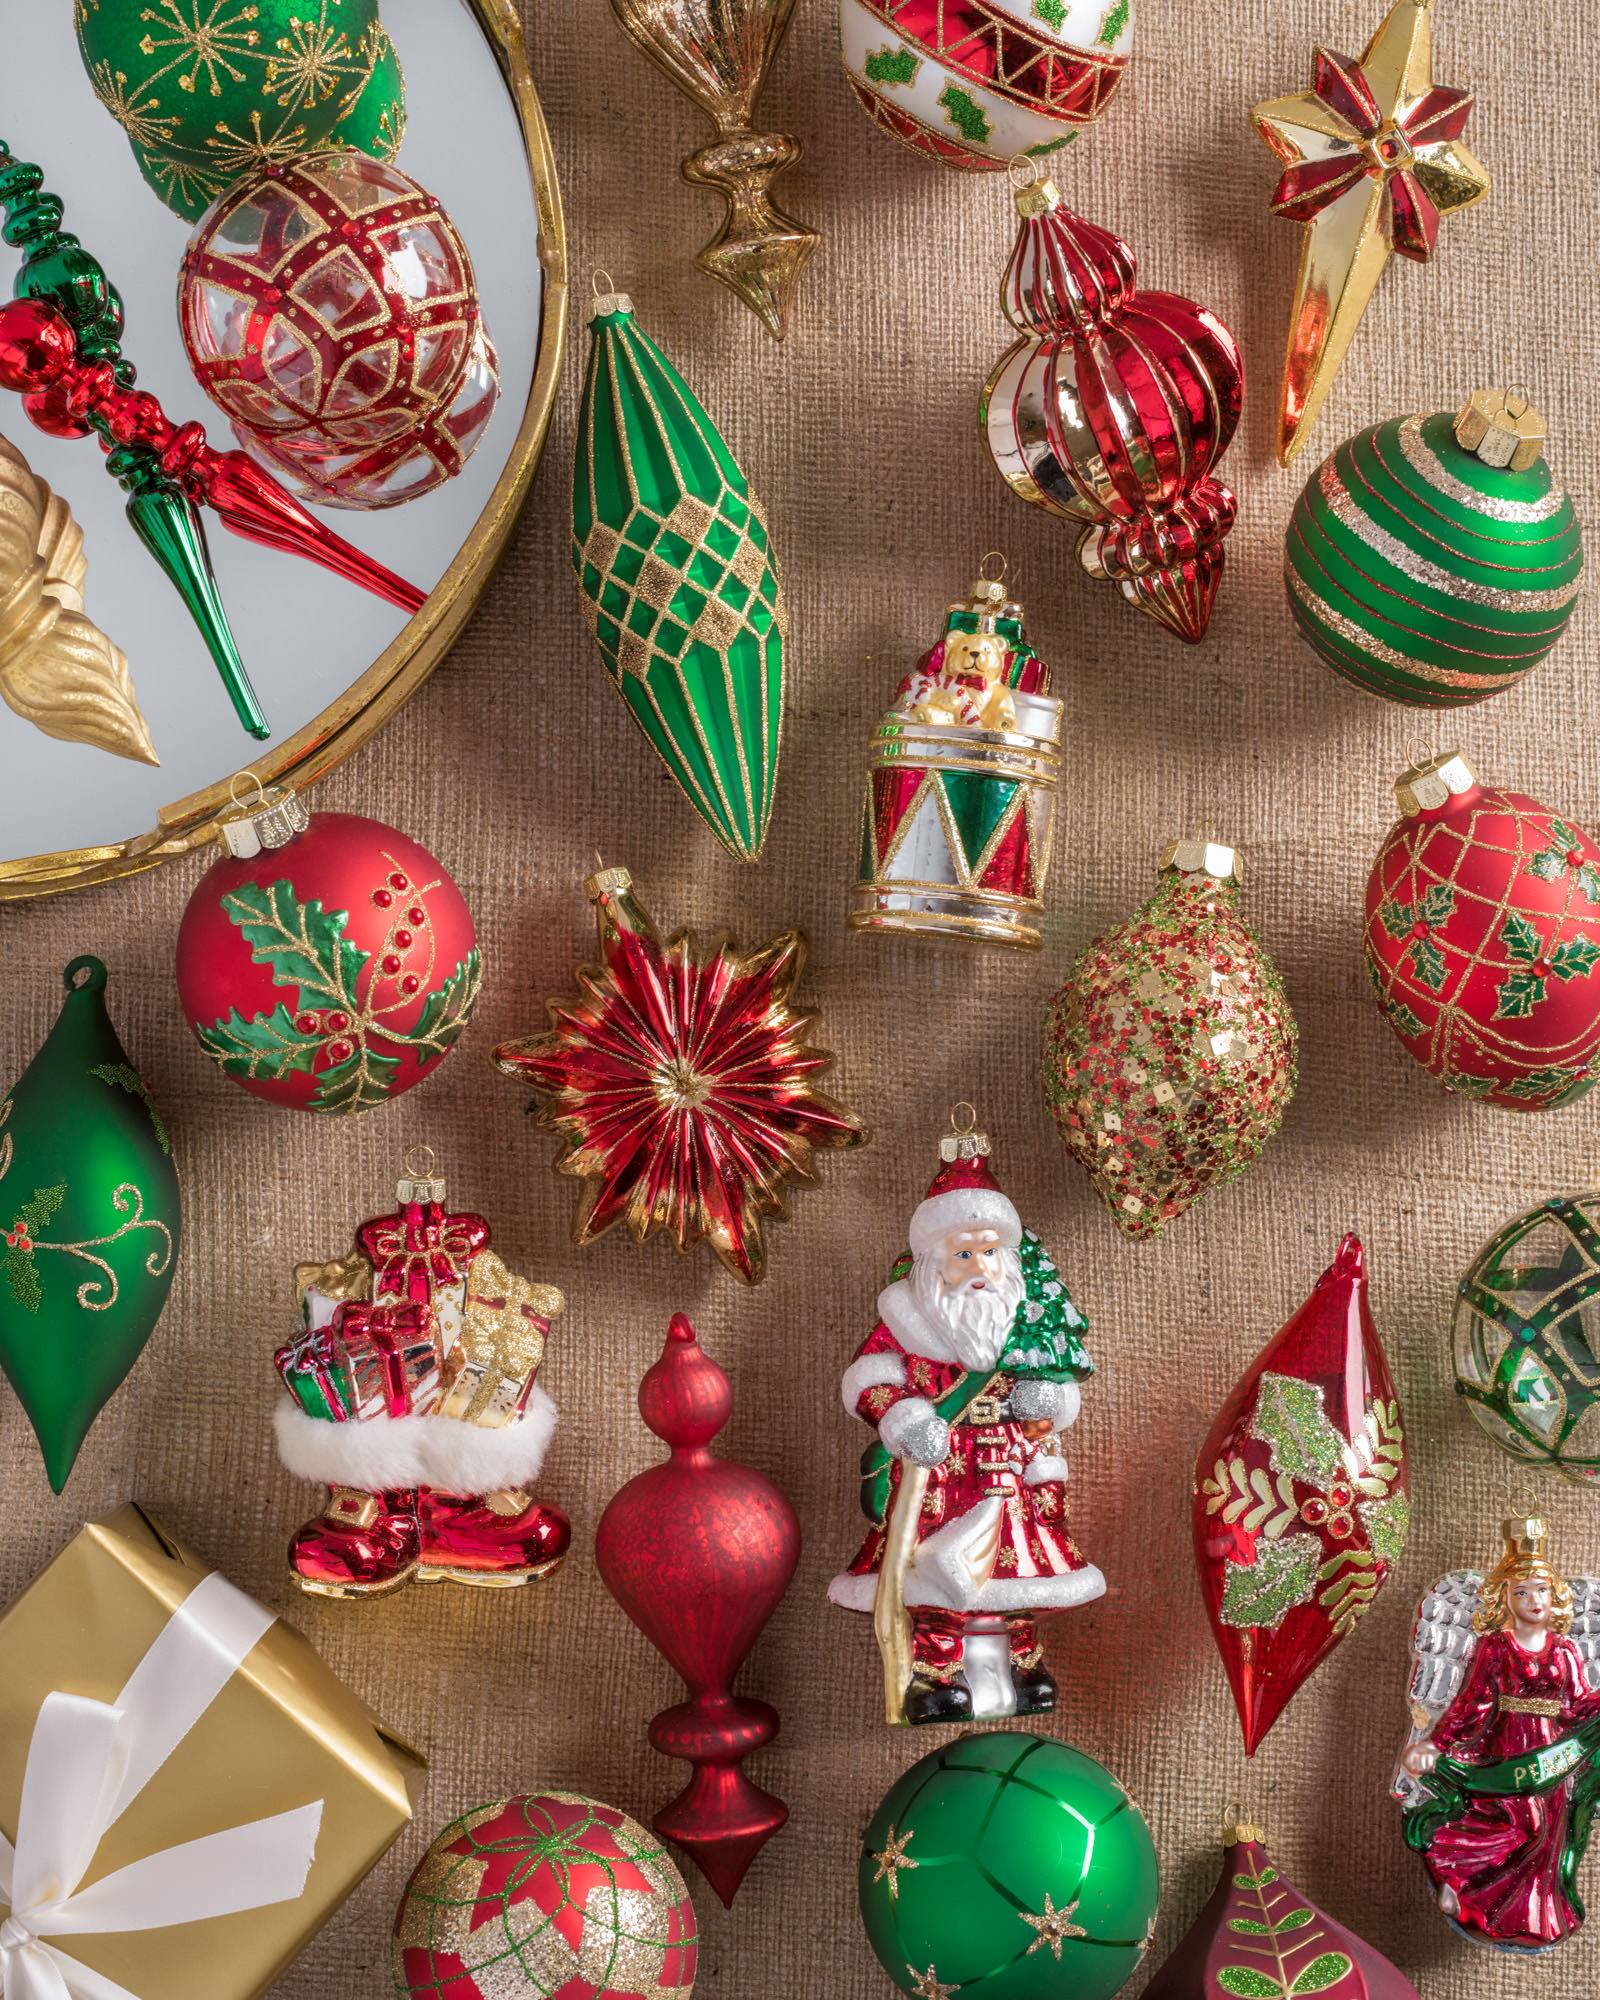 Christmas tree ornaments sets - Christmas Cheer Ornament Set Main